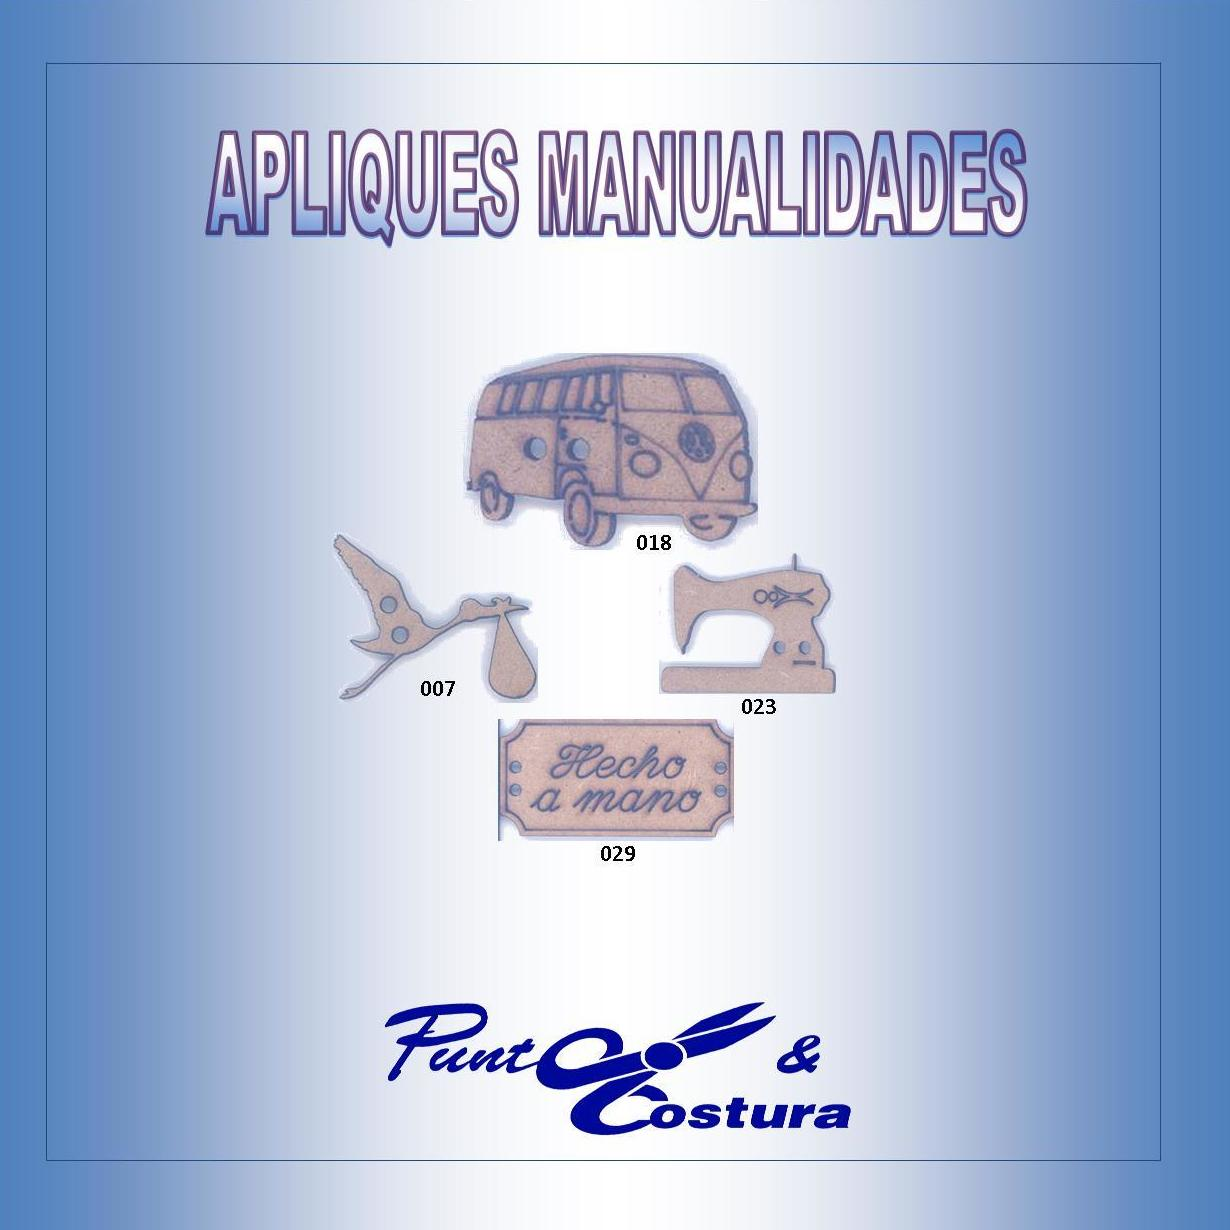 Apliques Manualidades: Catálogo de MANUEL RODRÍGUEZ MARTÍNEZ